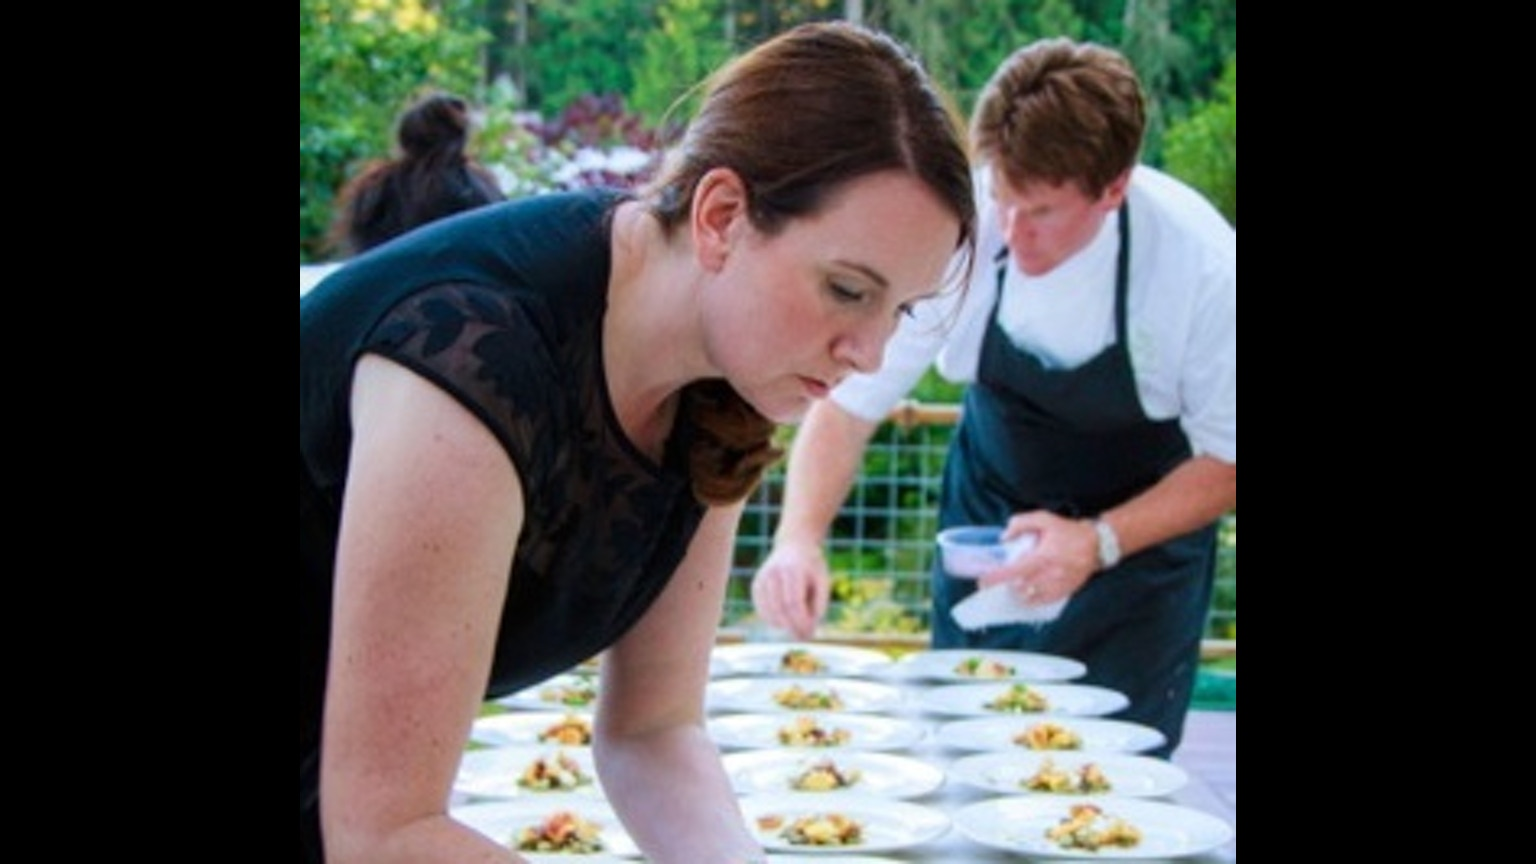 Orchard Kitchen Facebook Whidbey Island